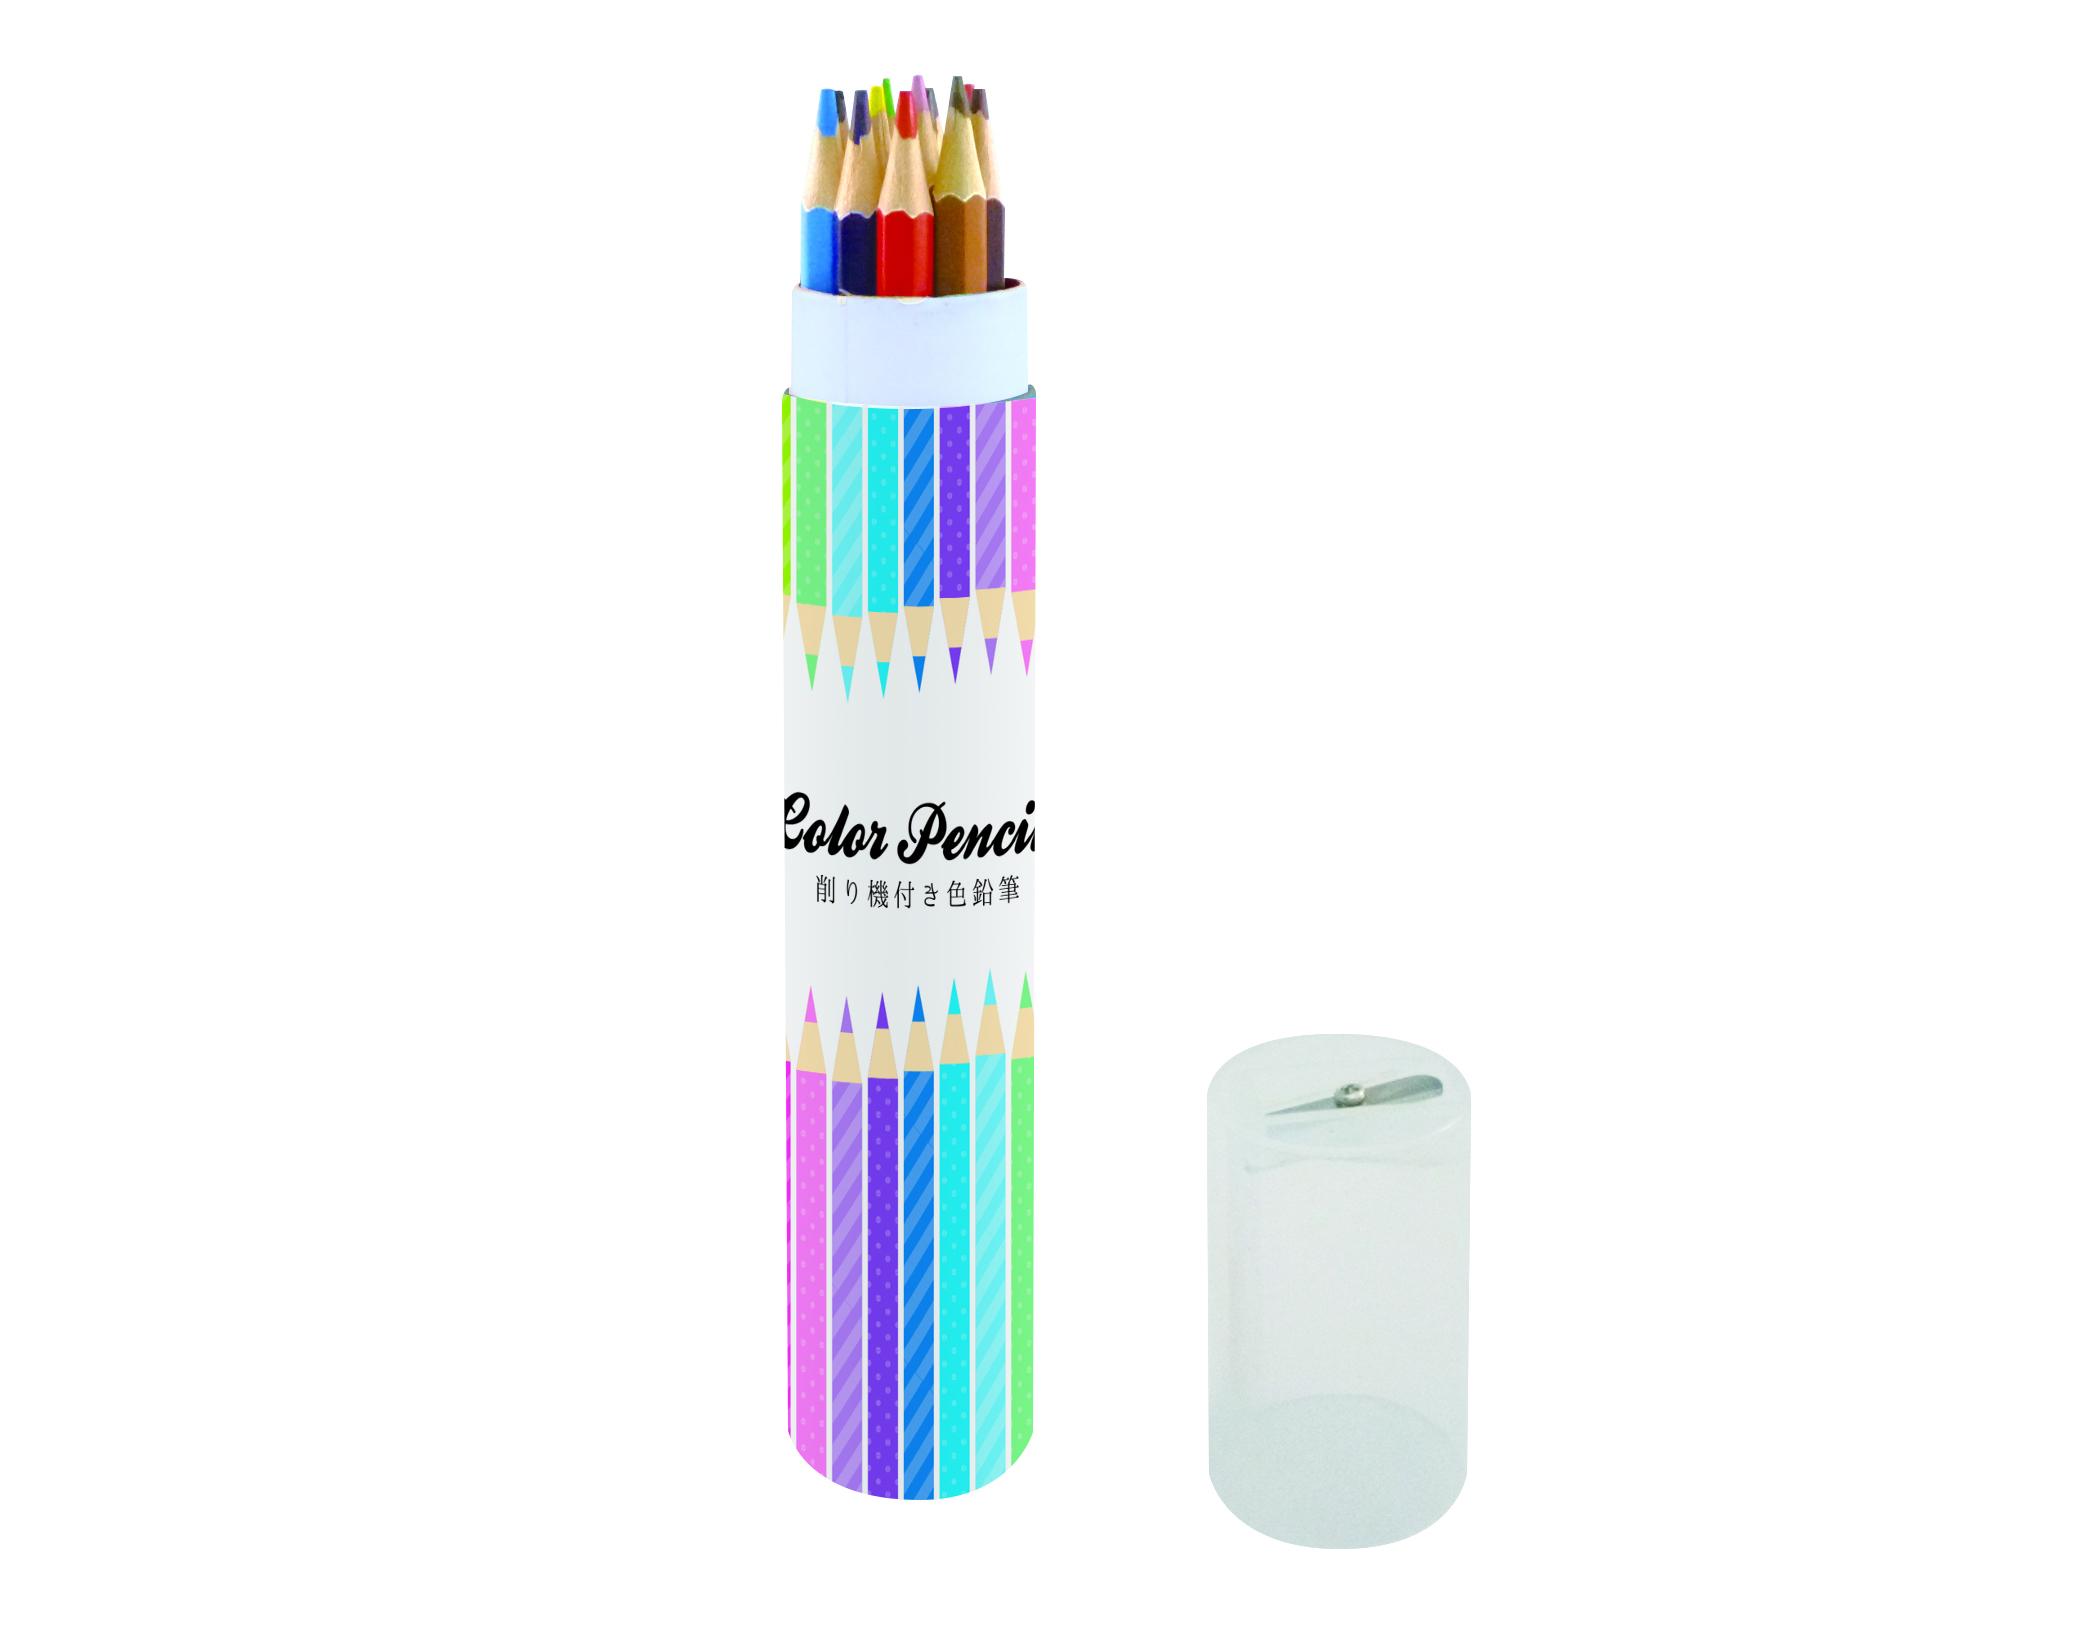 Vita stile 鉛筆削り付色鉛筆(12色)画像